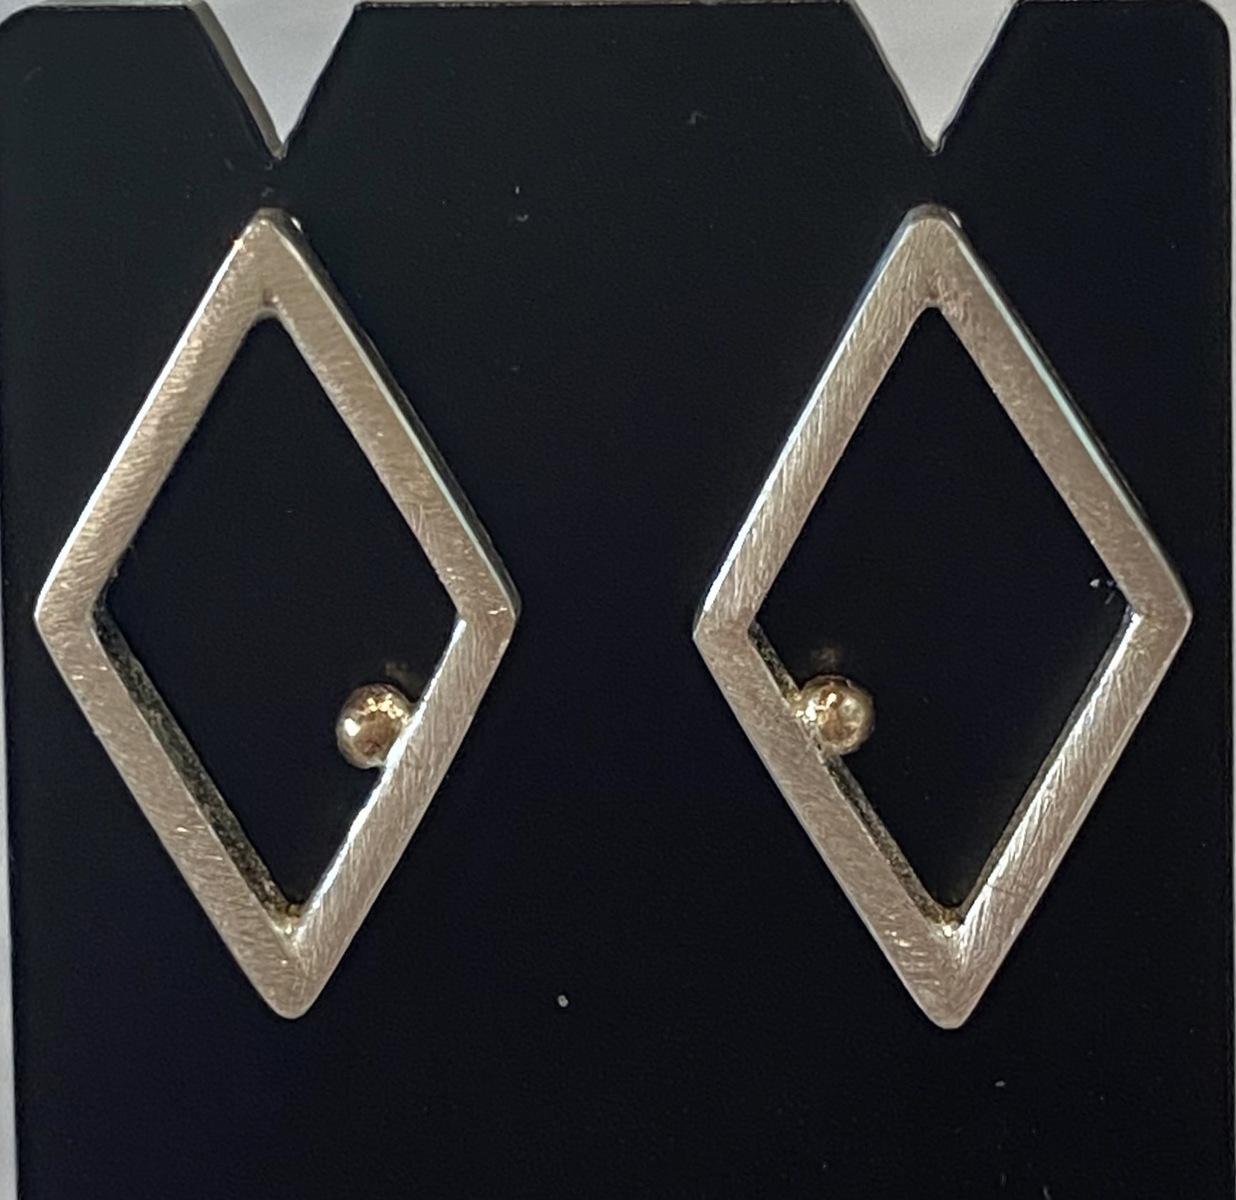 Diamond shape earrings with gold ball